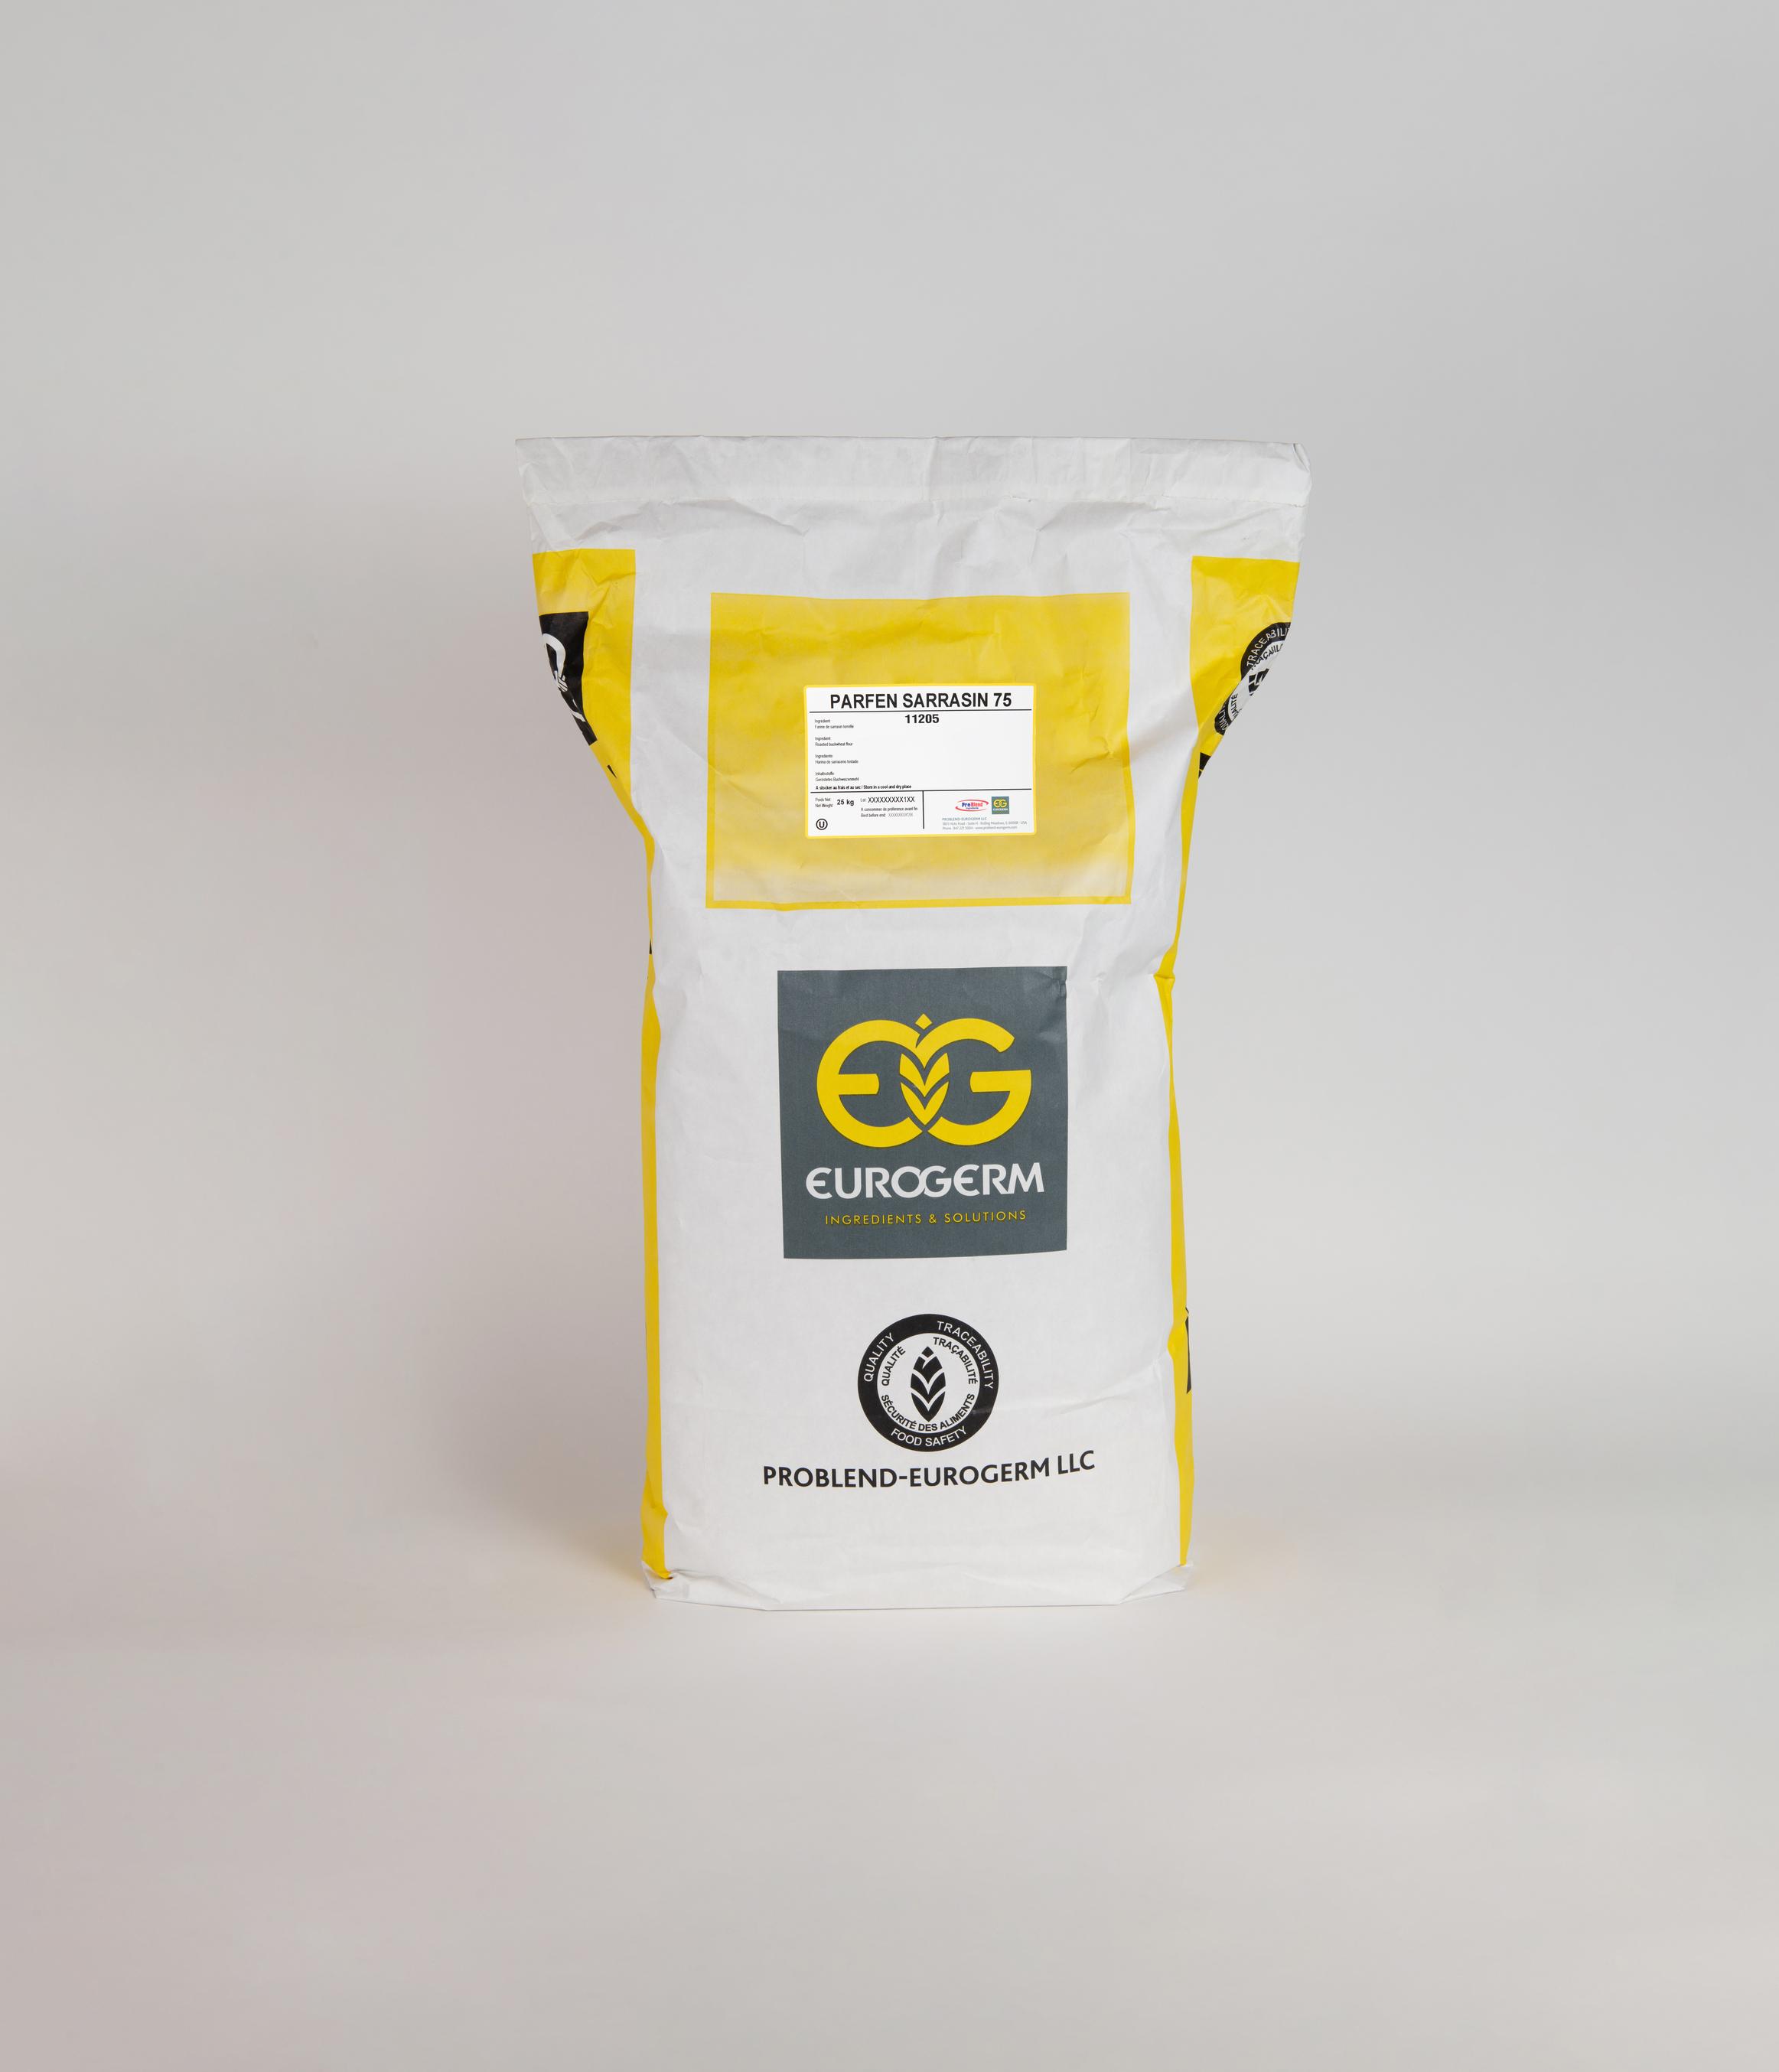 Parfen Sarasin (Buckwheat) - Toasted Buckwheat Flour (Item #11205 Eurogerm) main image